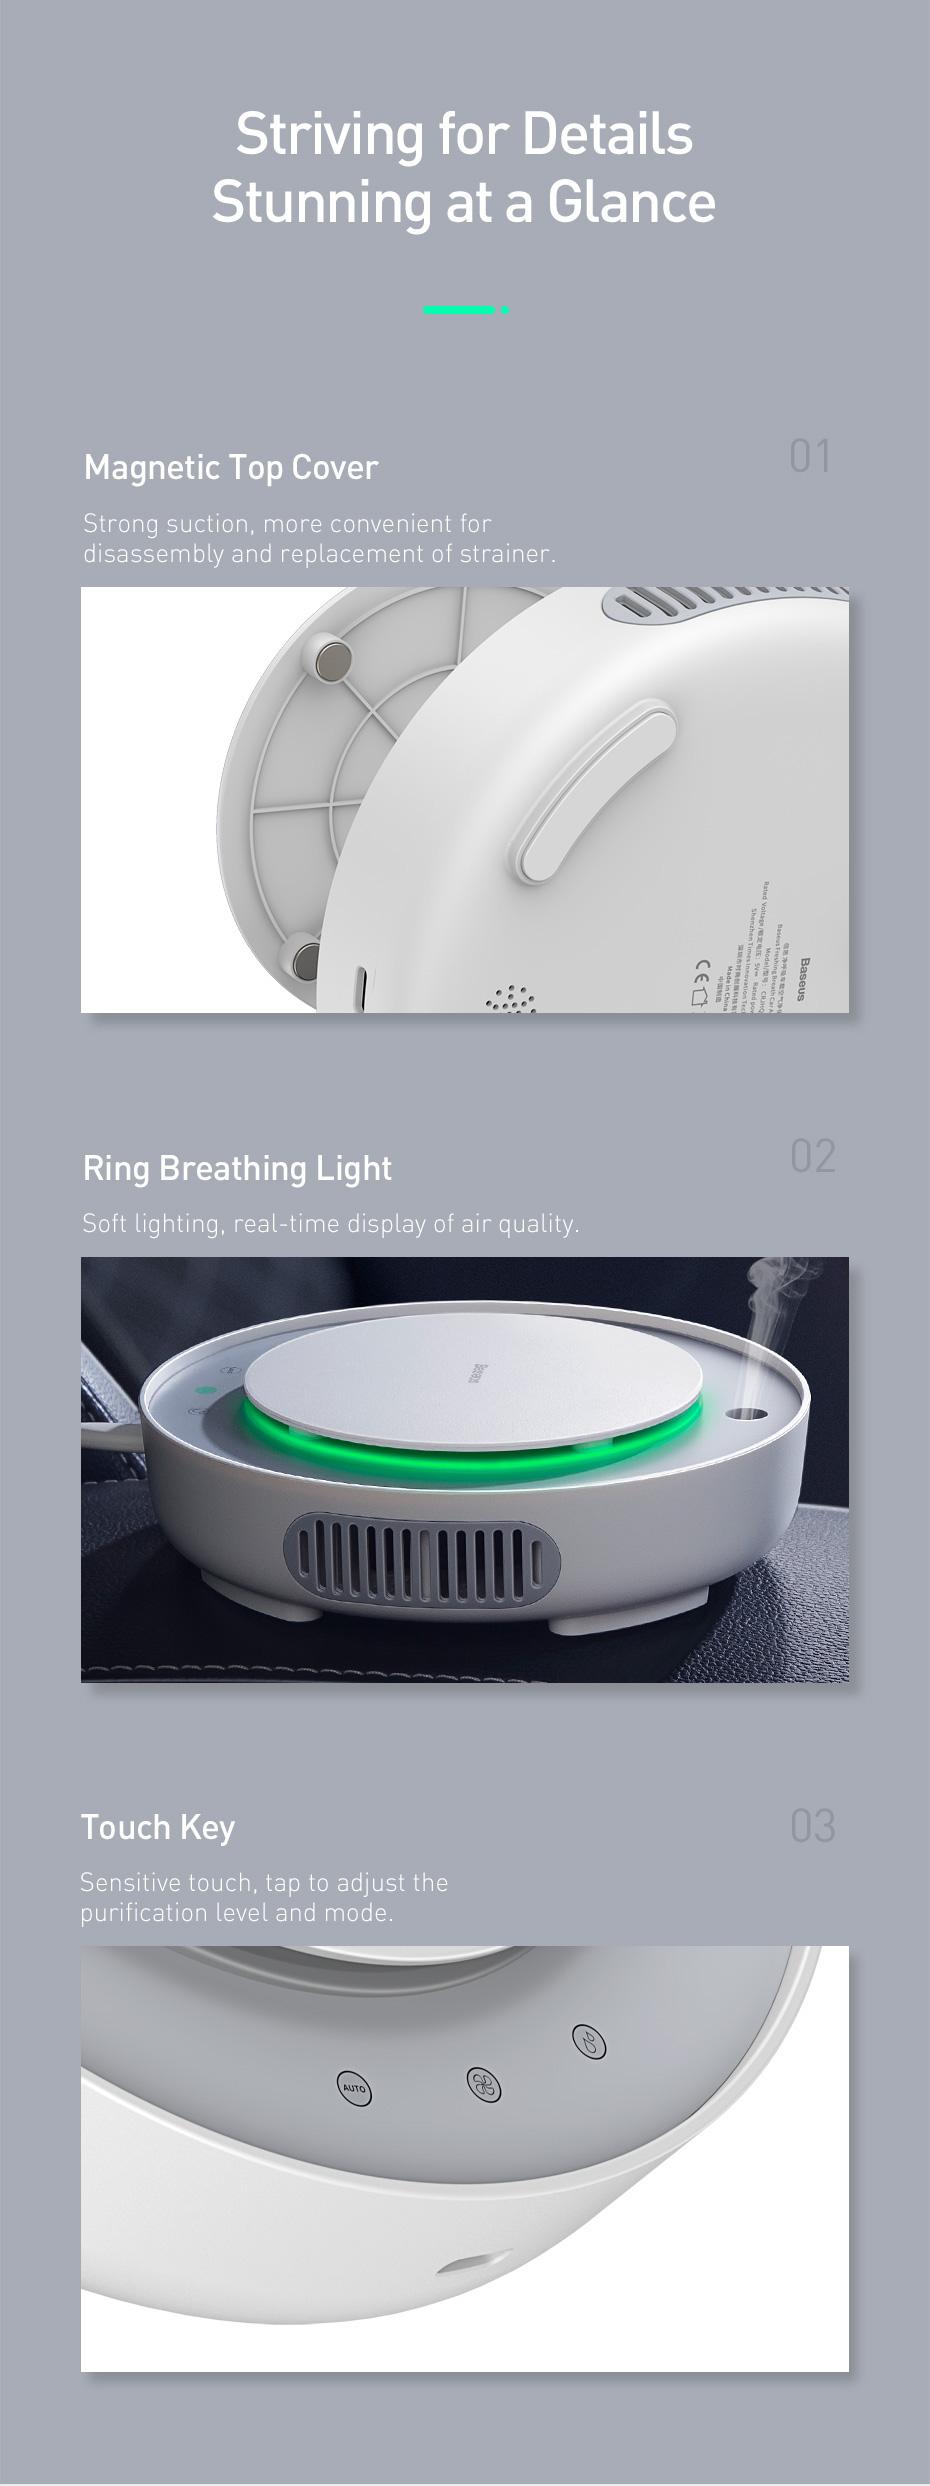 Baseus Car Air Purifier Freshener Mini Electric Auto Air Ionizer Cleaner Humidifier For Home Office Car Vaporizer Air Fresher 23